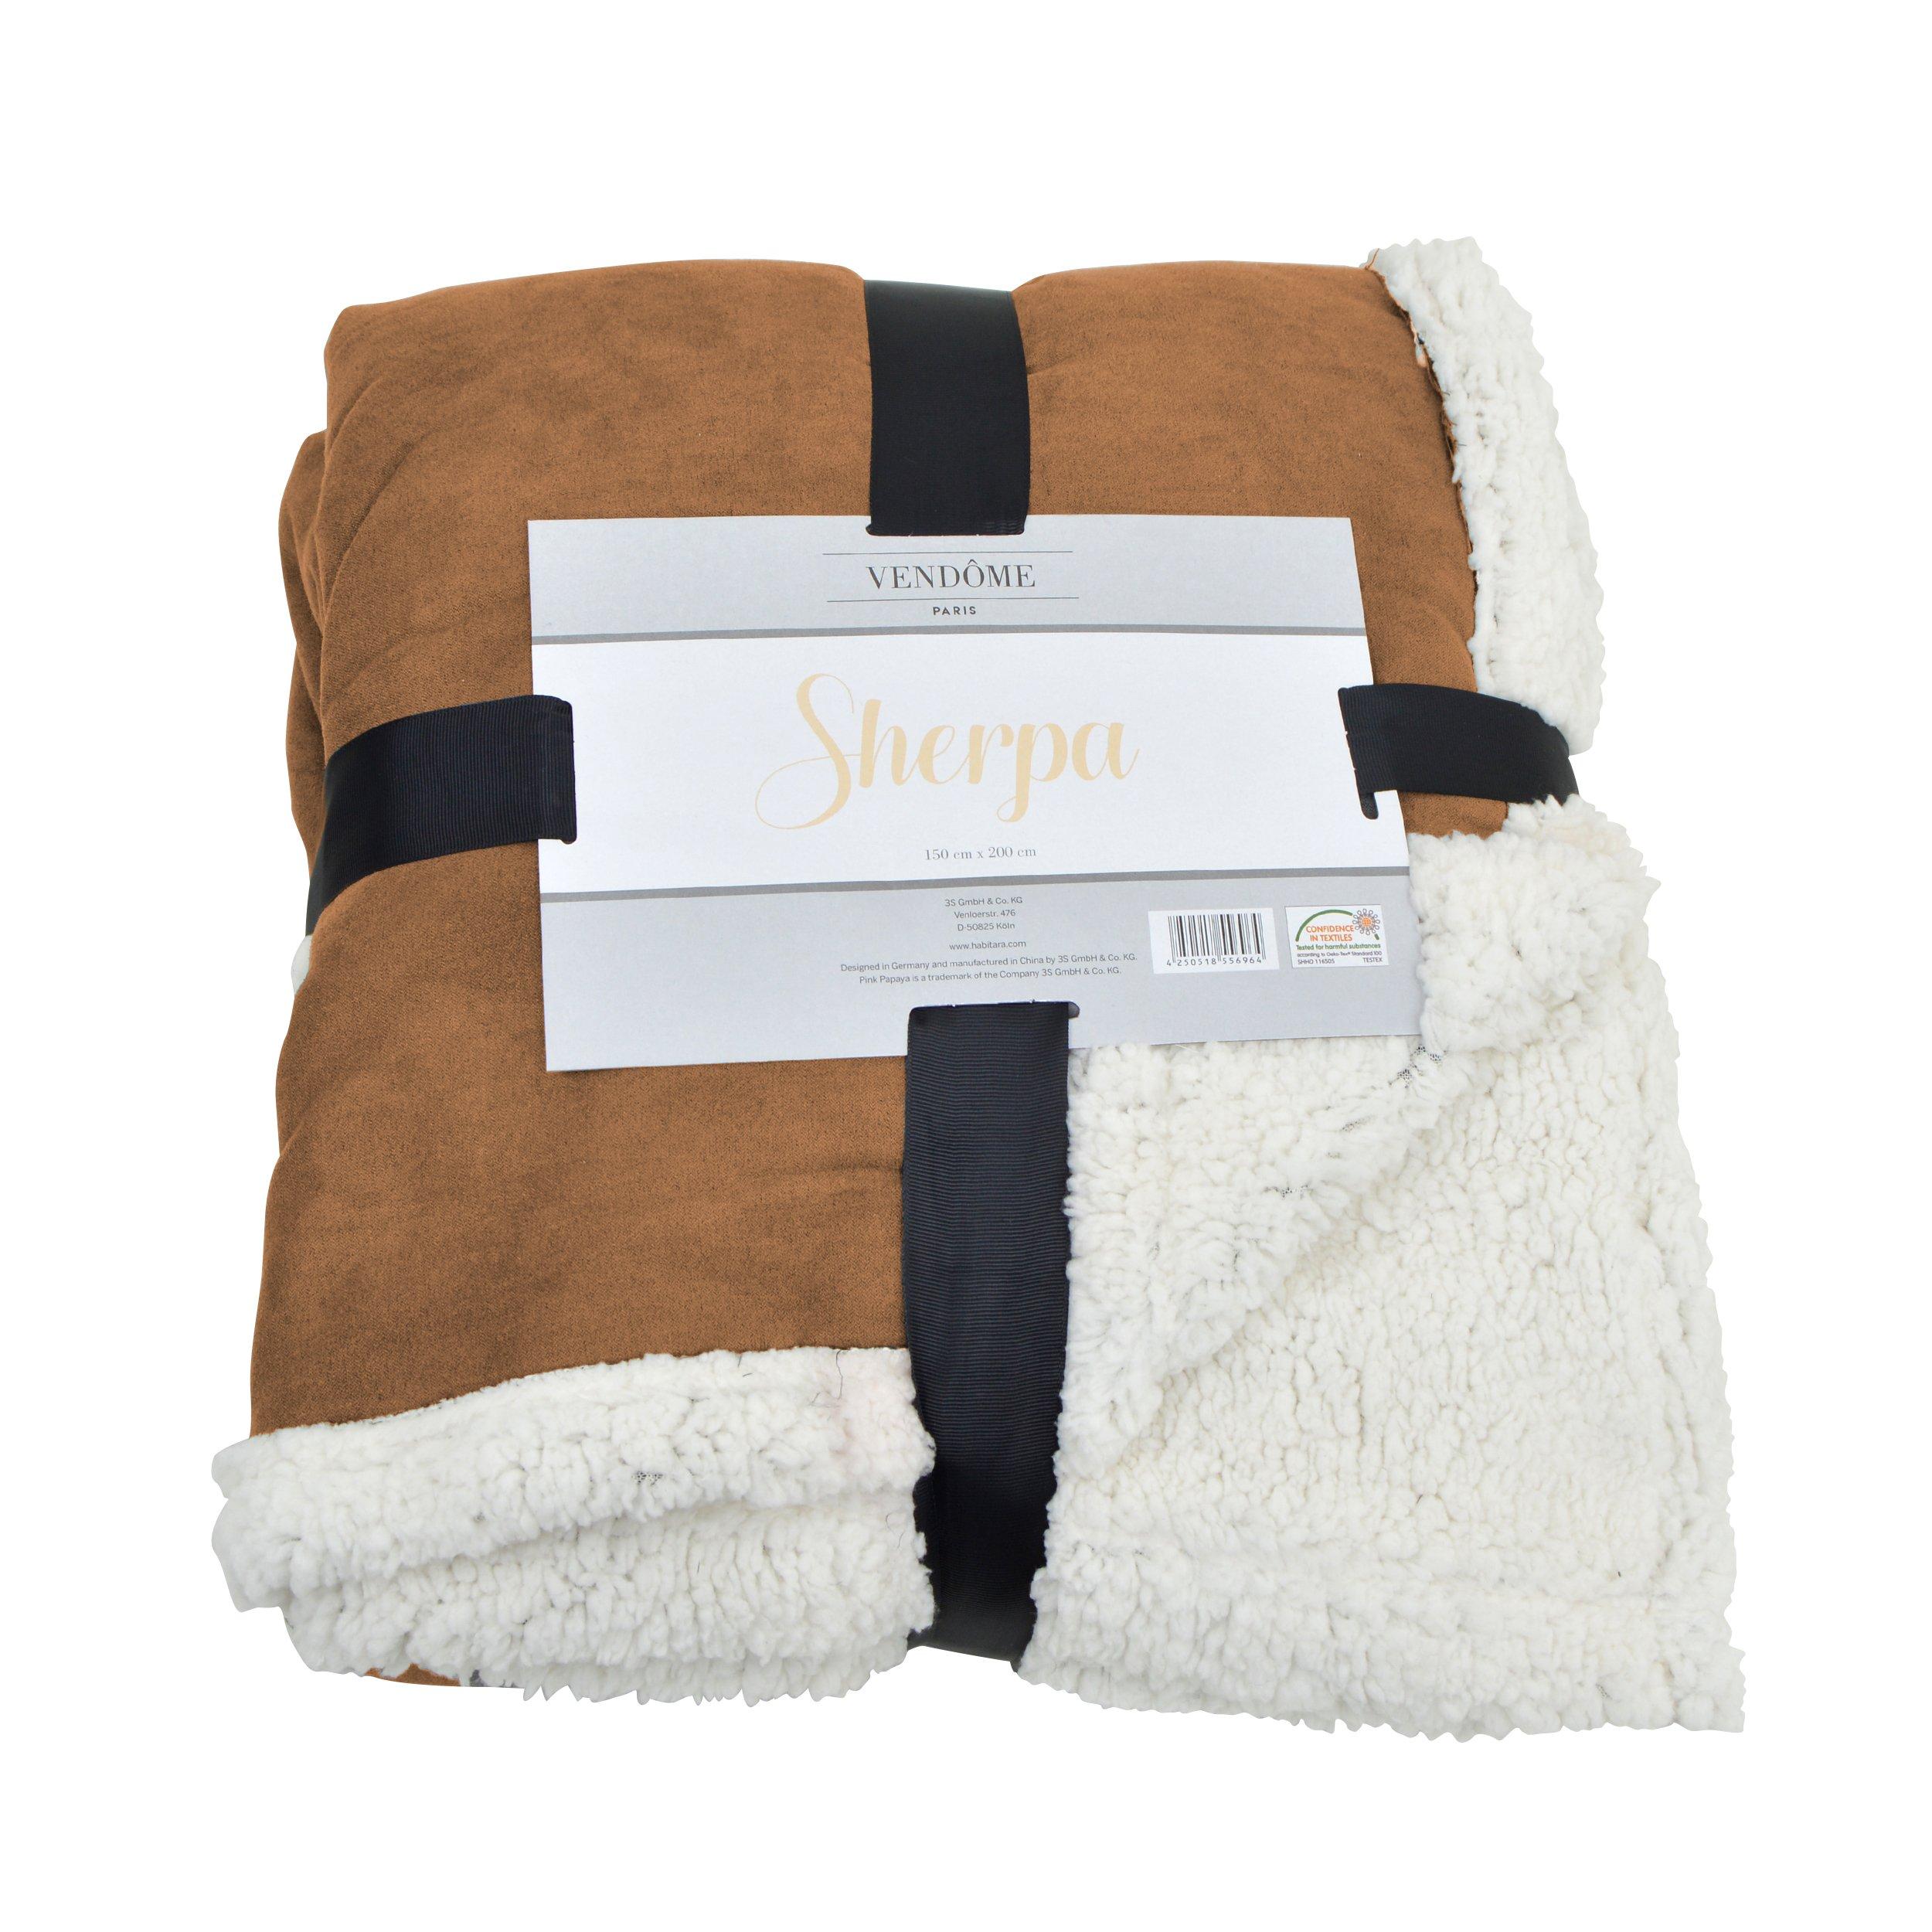 Vendôme Sherpa, manta de alta calidad XXL de felpa súper blanda, 200 x 150cm